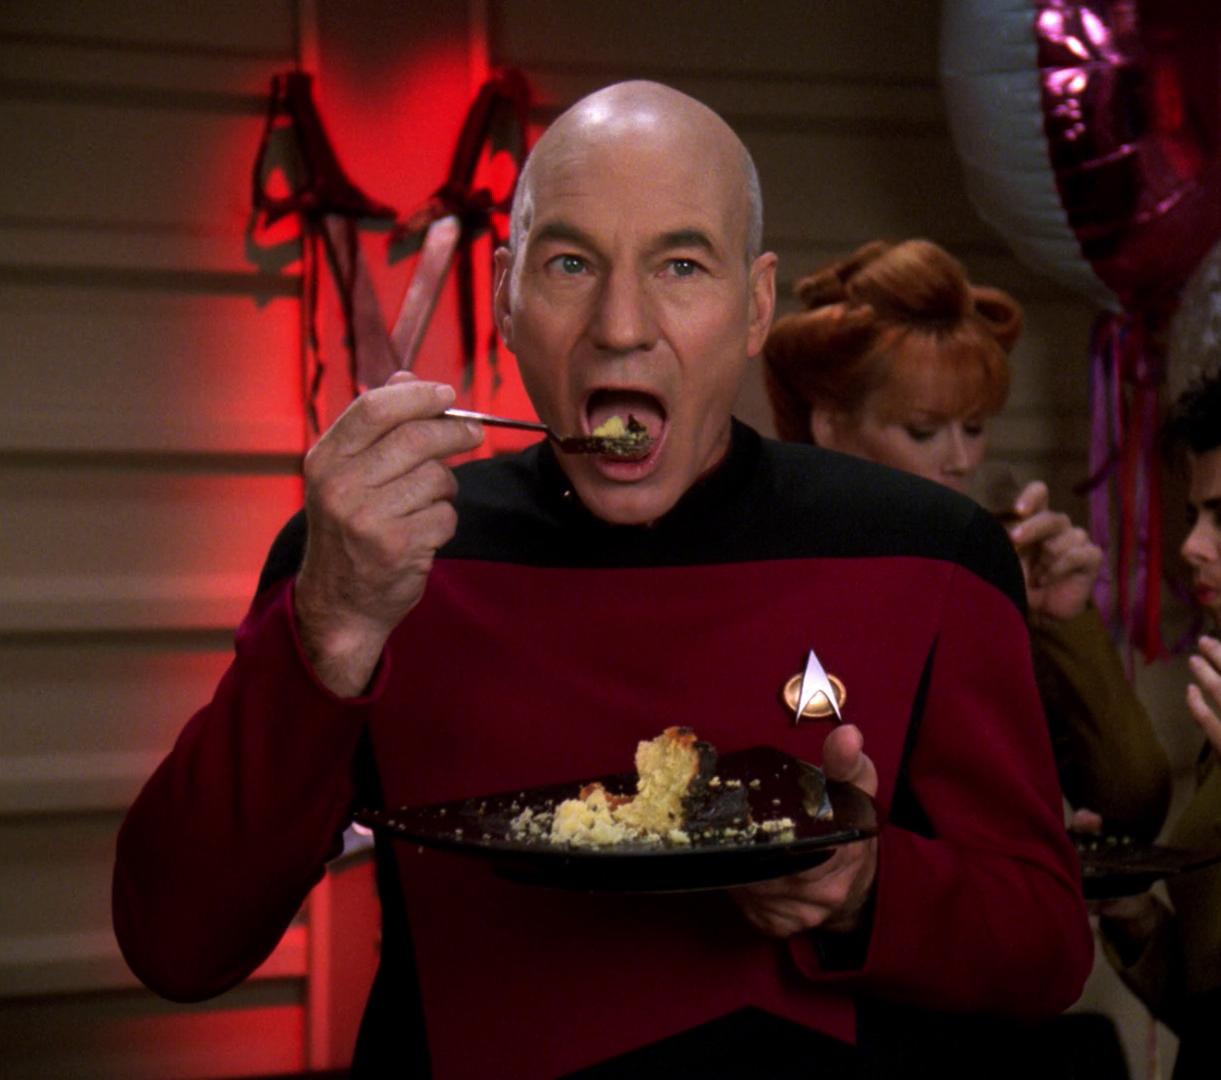 Picard_eats_cake.jpg